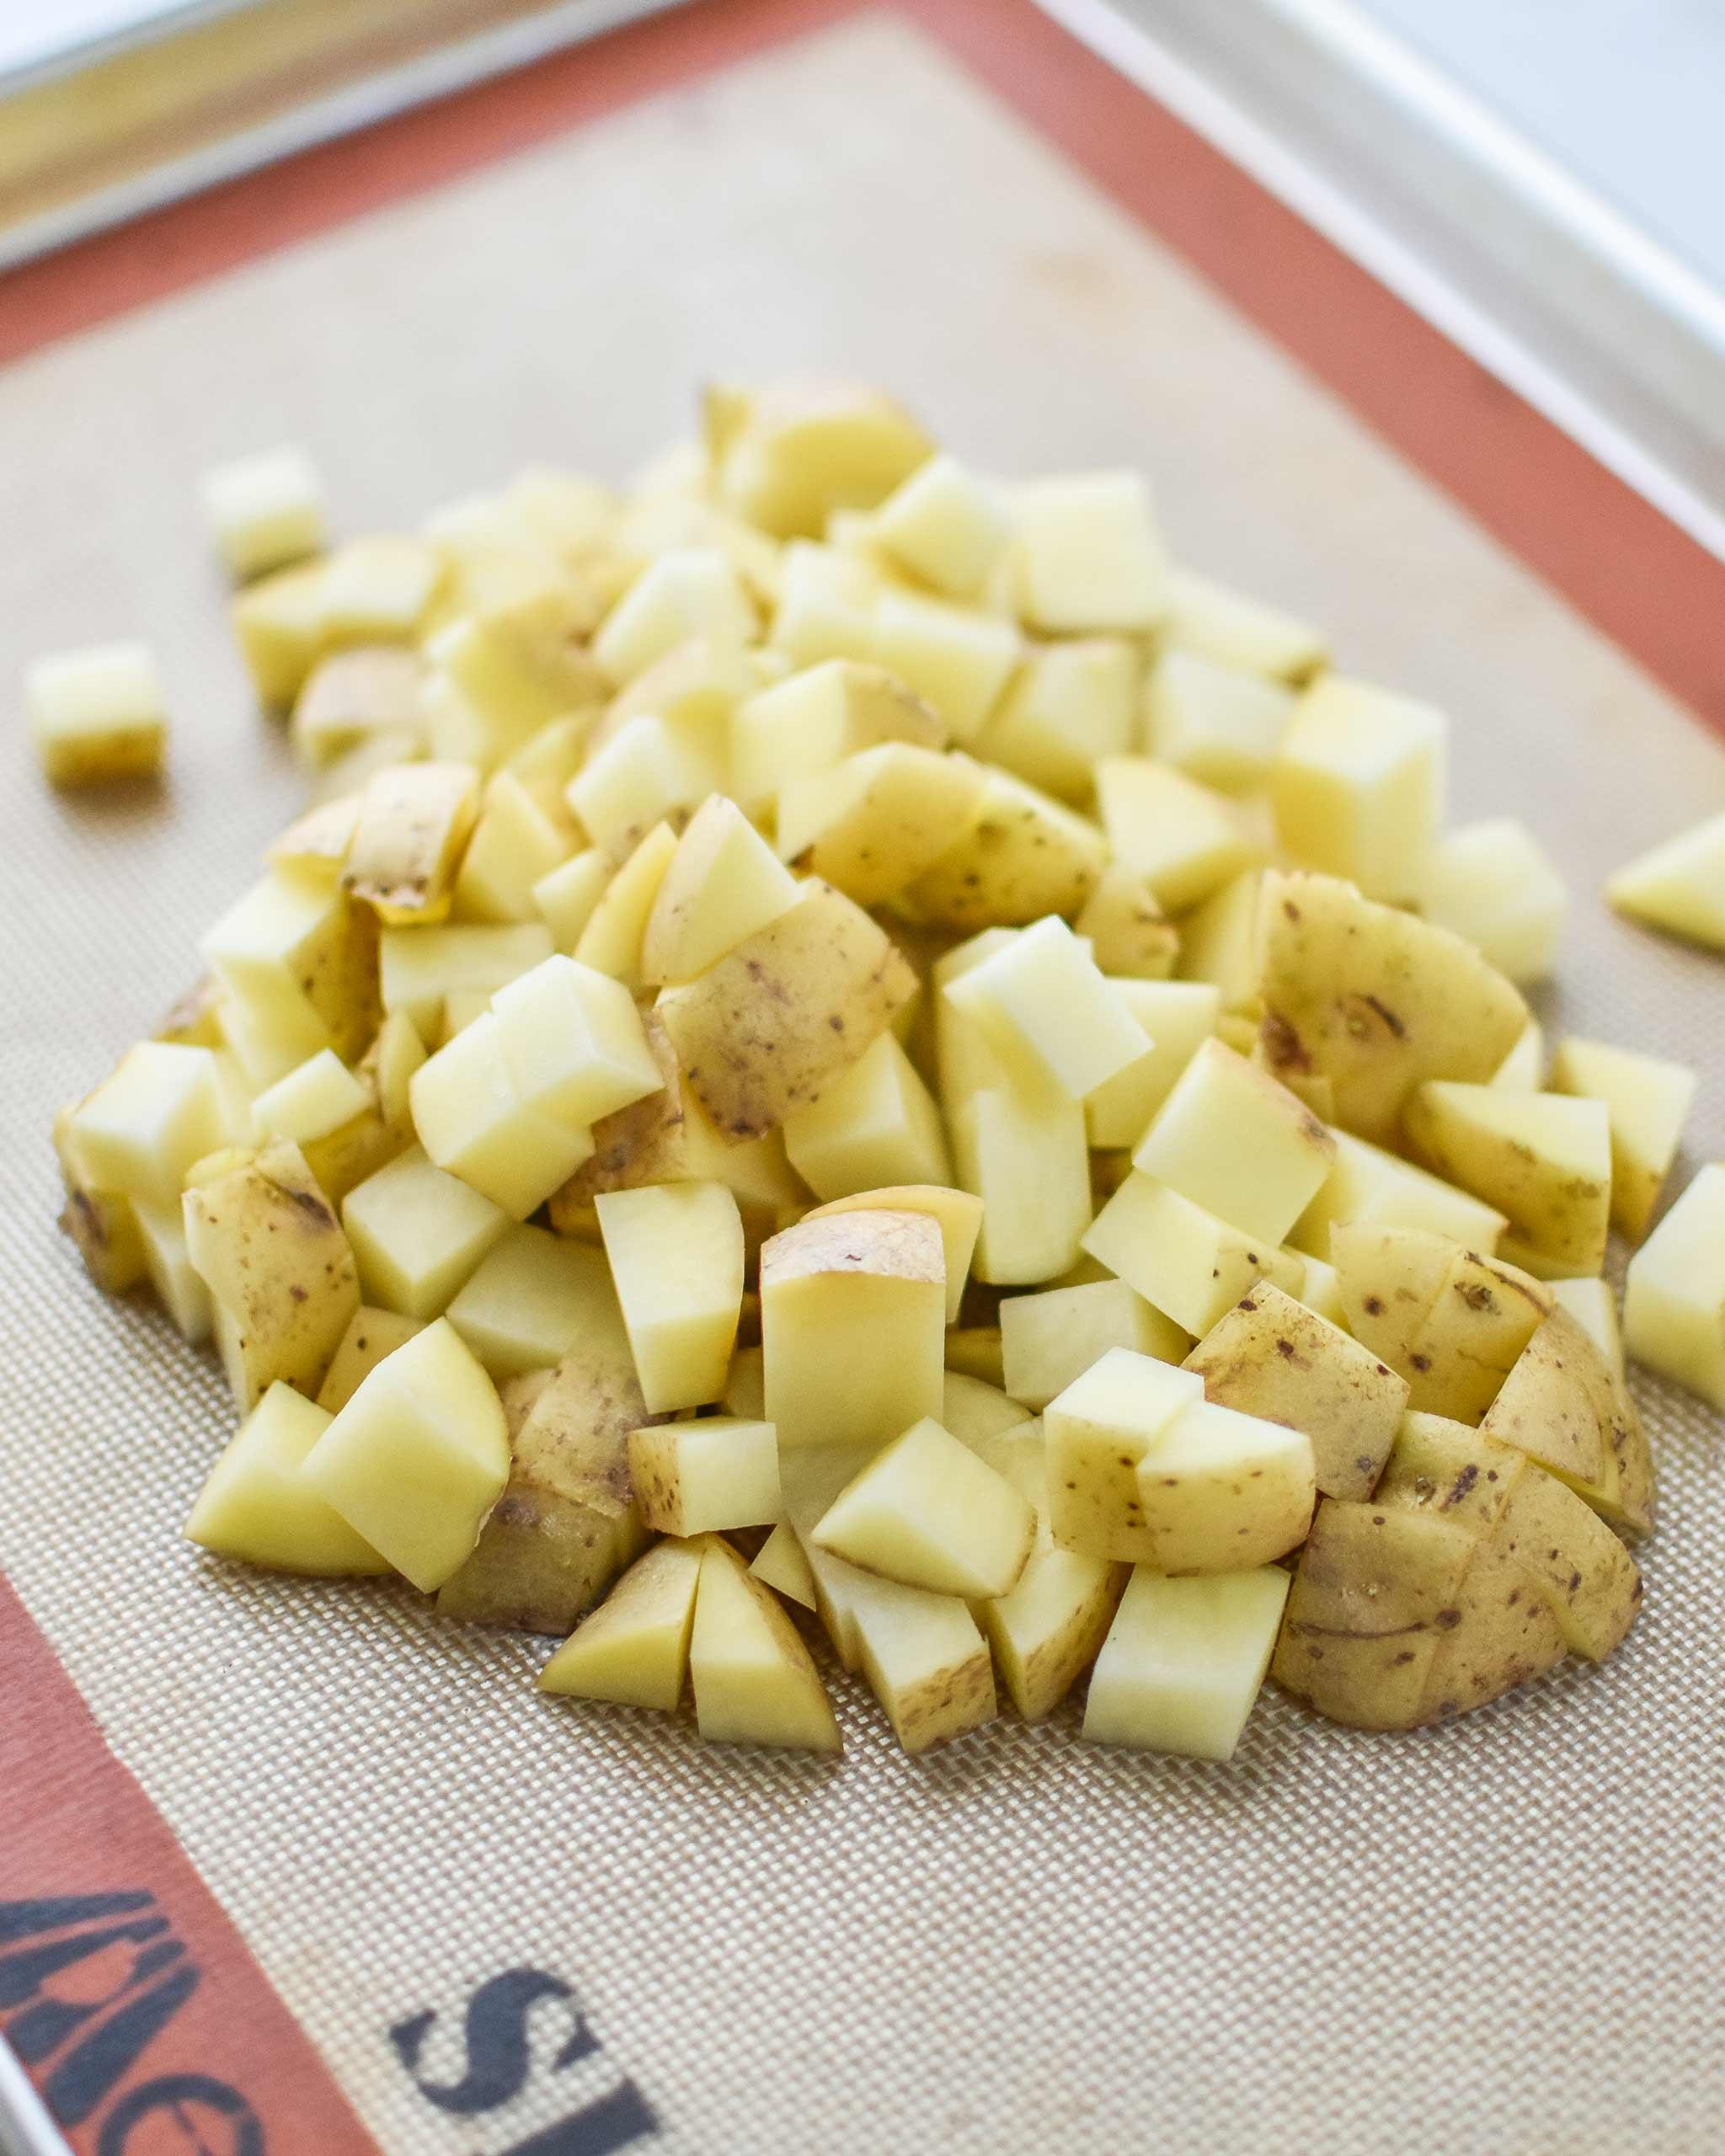 diced yukon gold potatoes on a sheet pan